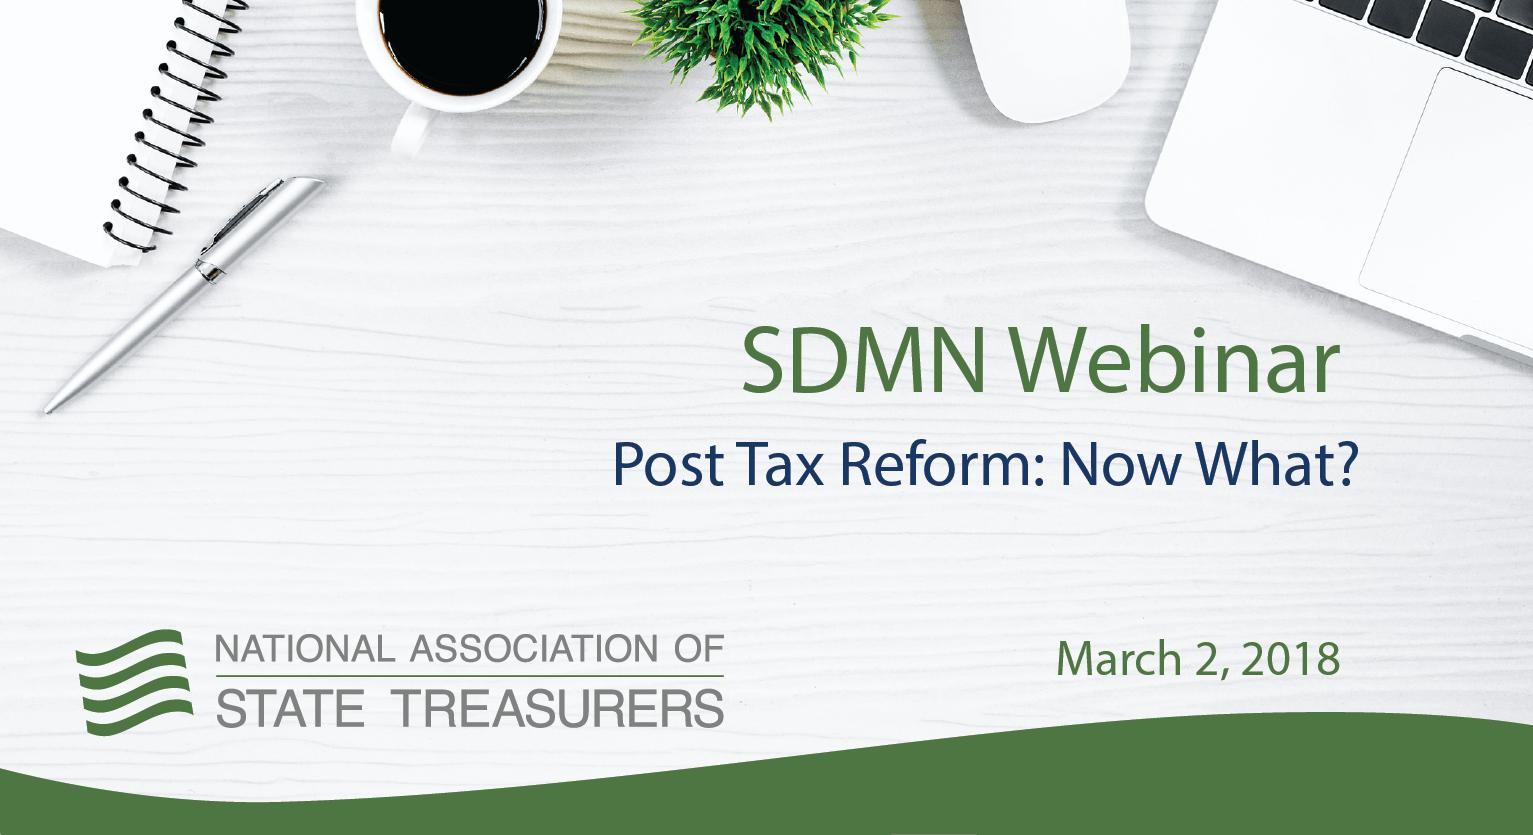 SDMN Webinar - Post Tax Reform